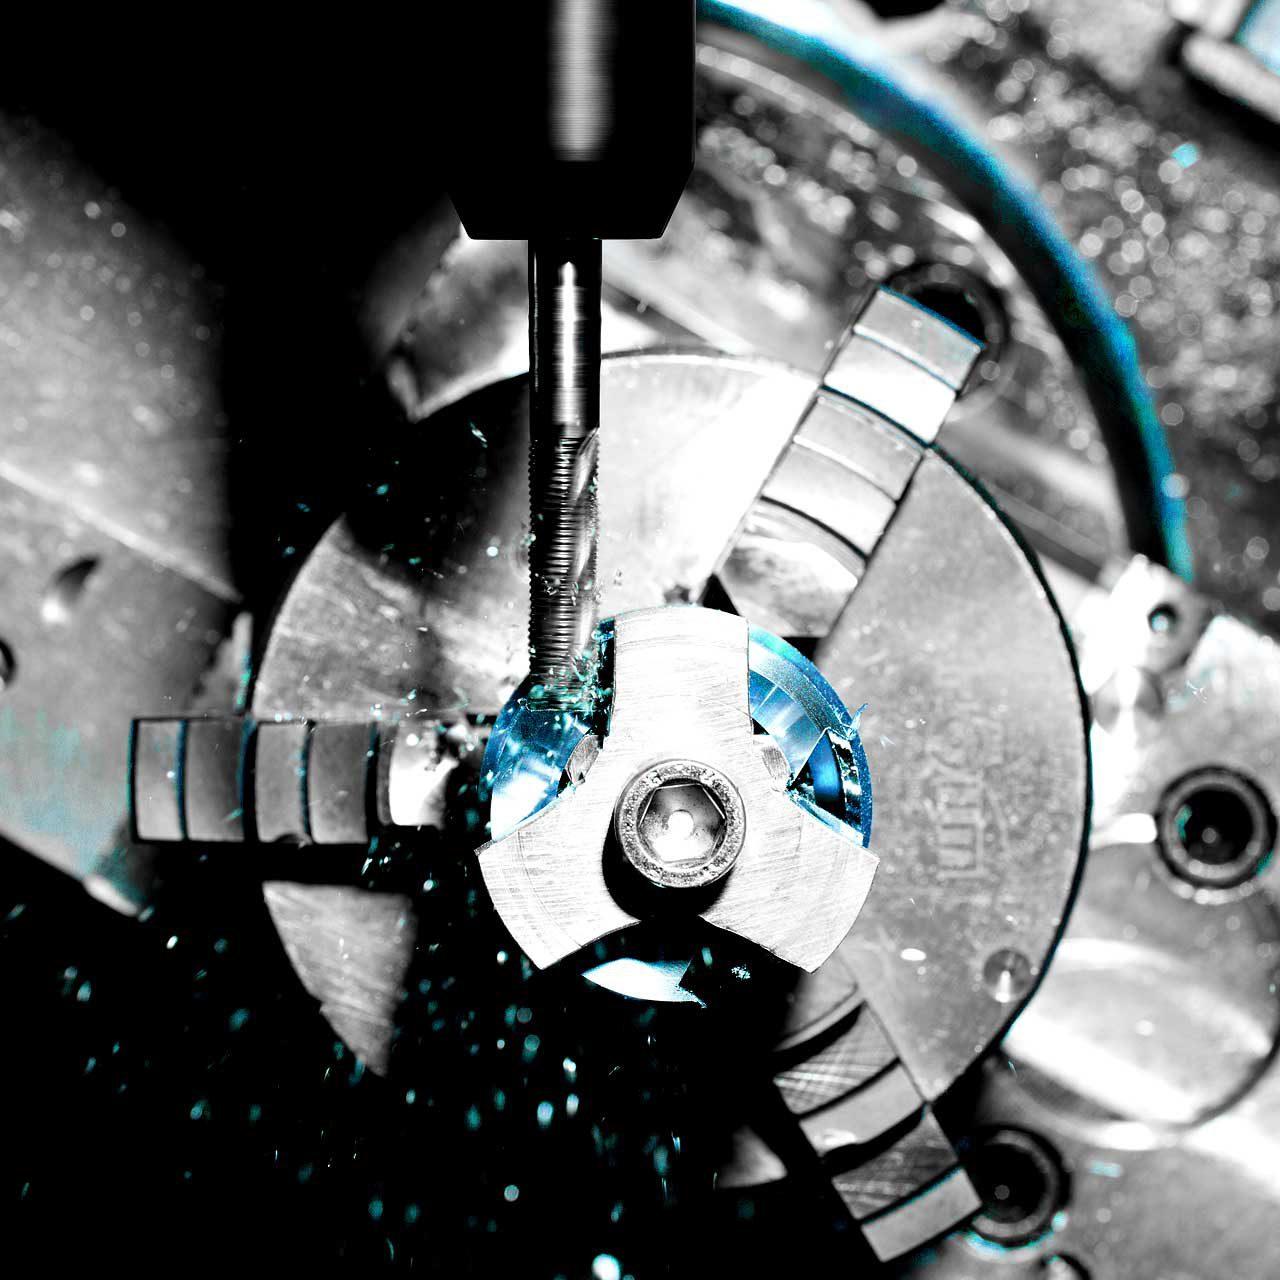 SAT STERLING Manufacturing